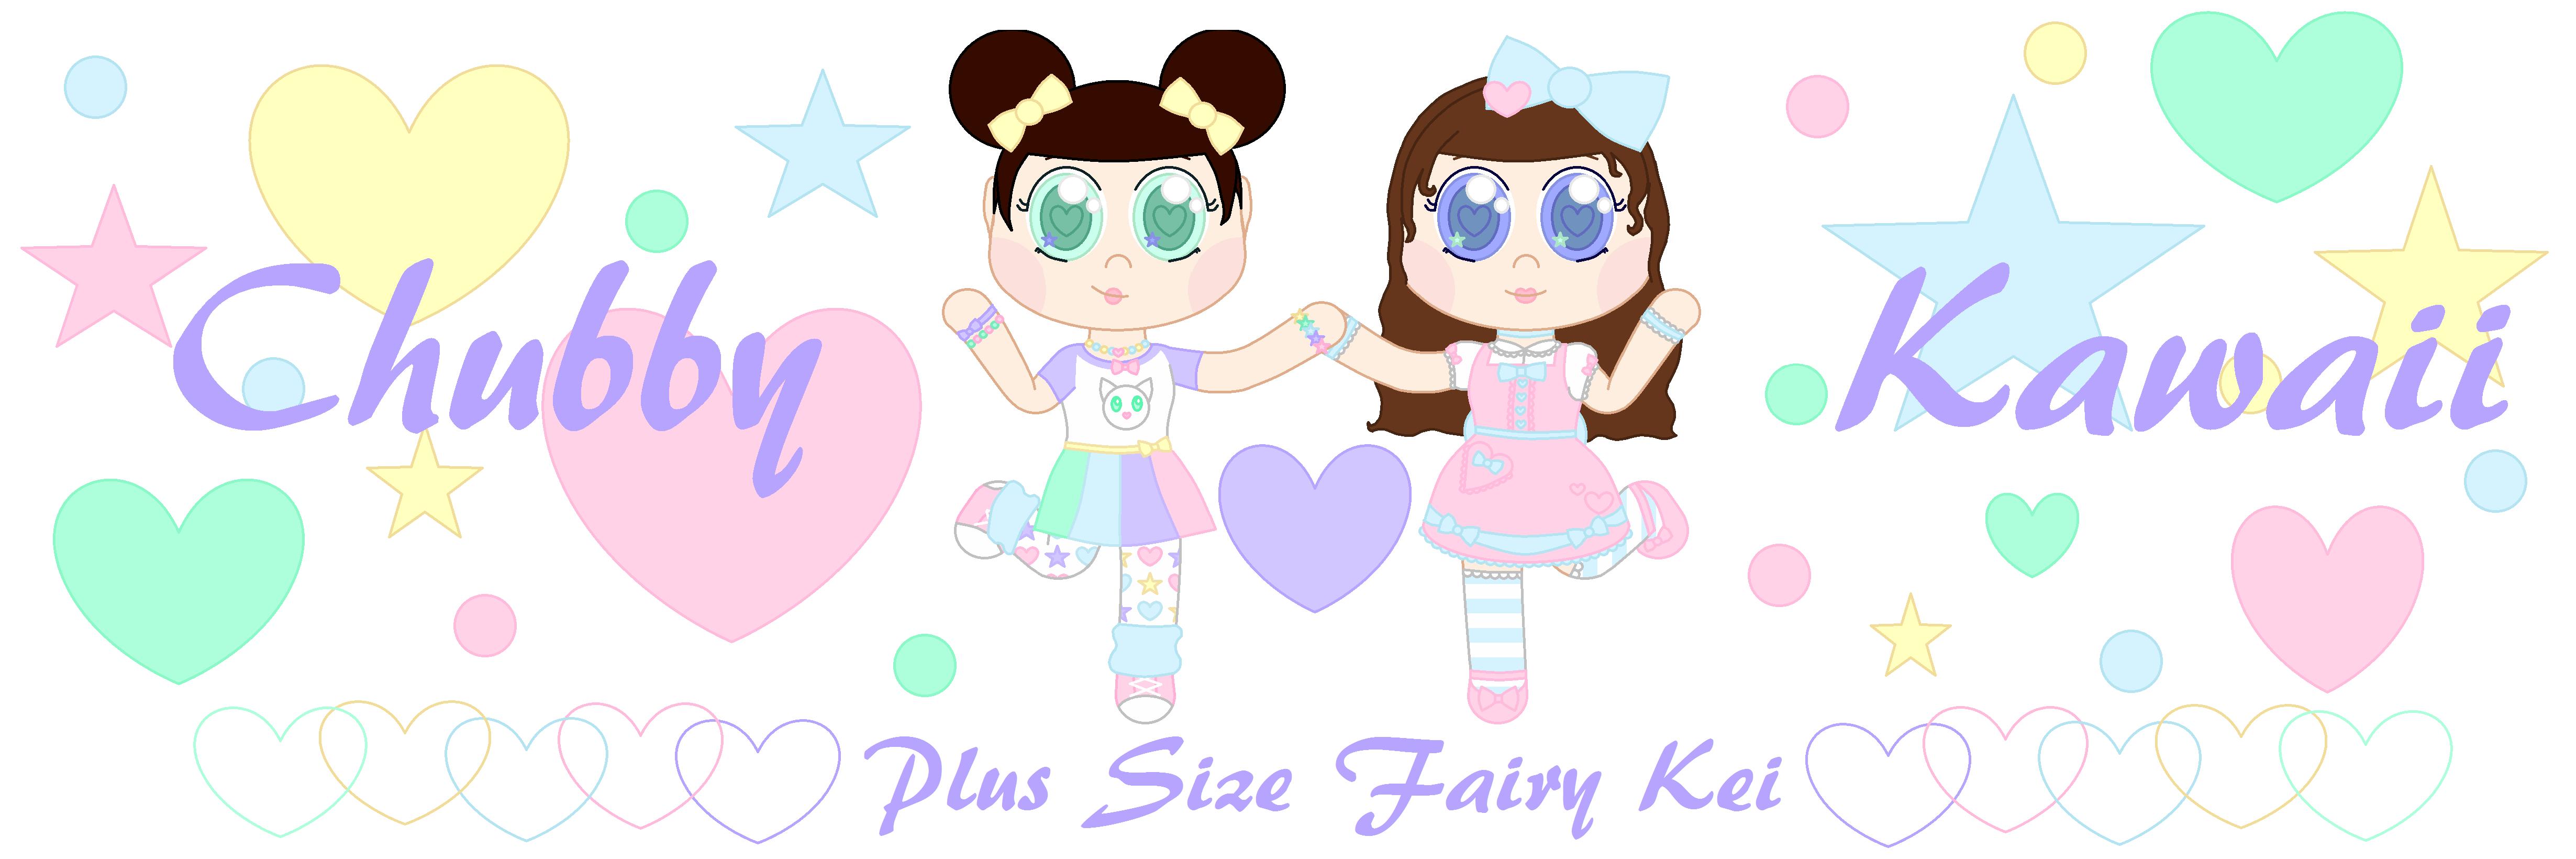 Chubby Kawaii Plus Size Fairy Kei O Hoppy Easter Everyone Top